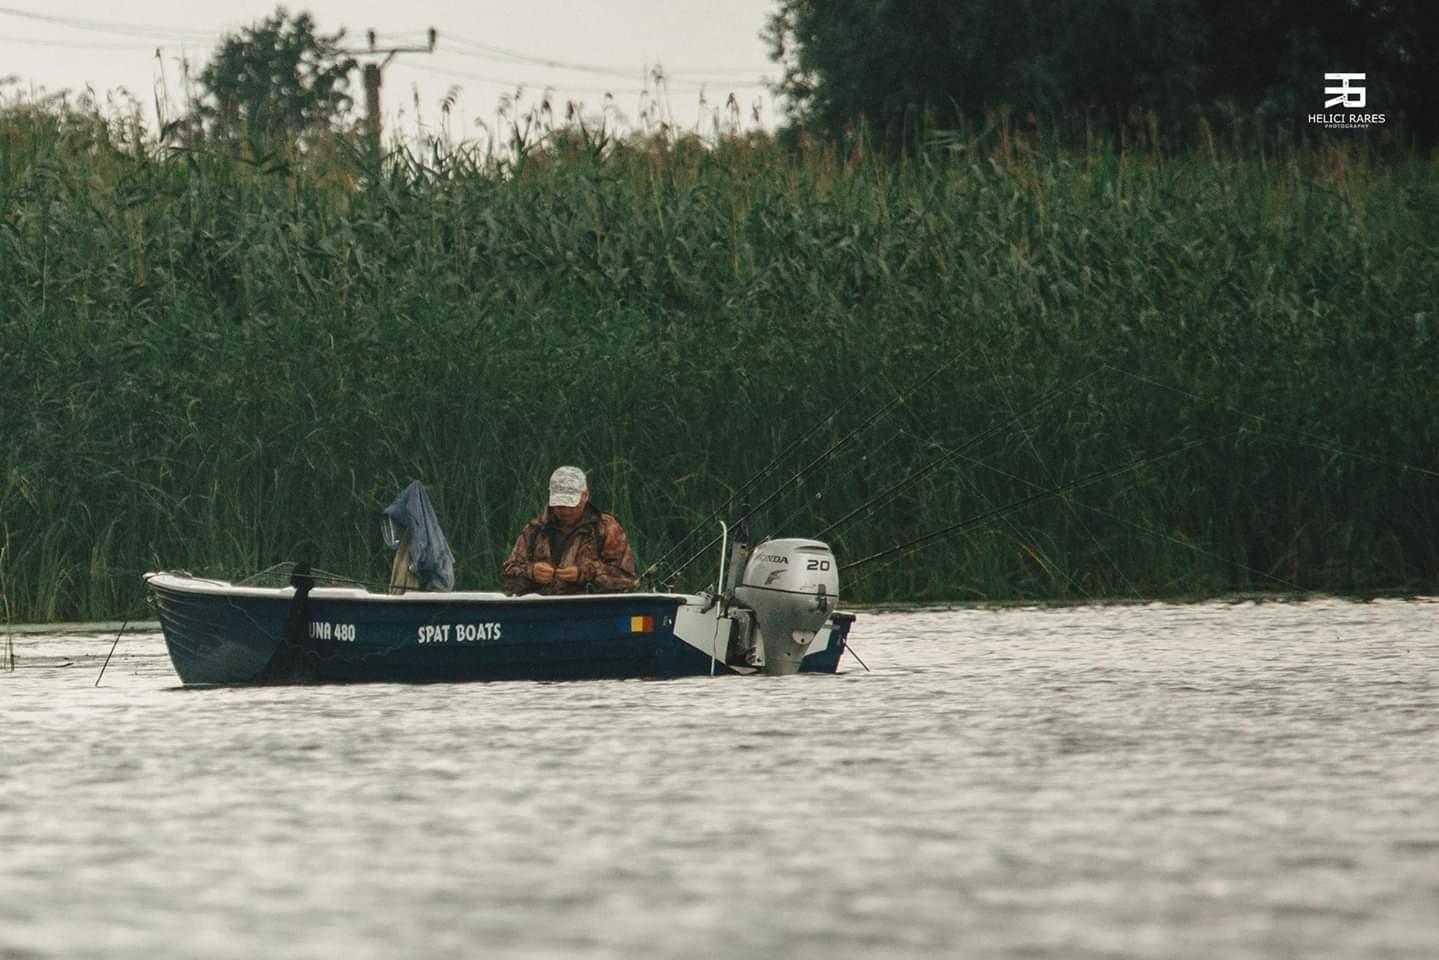 pescar-in-barca